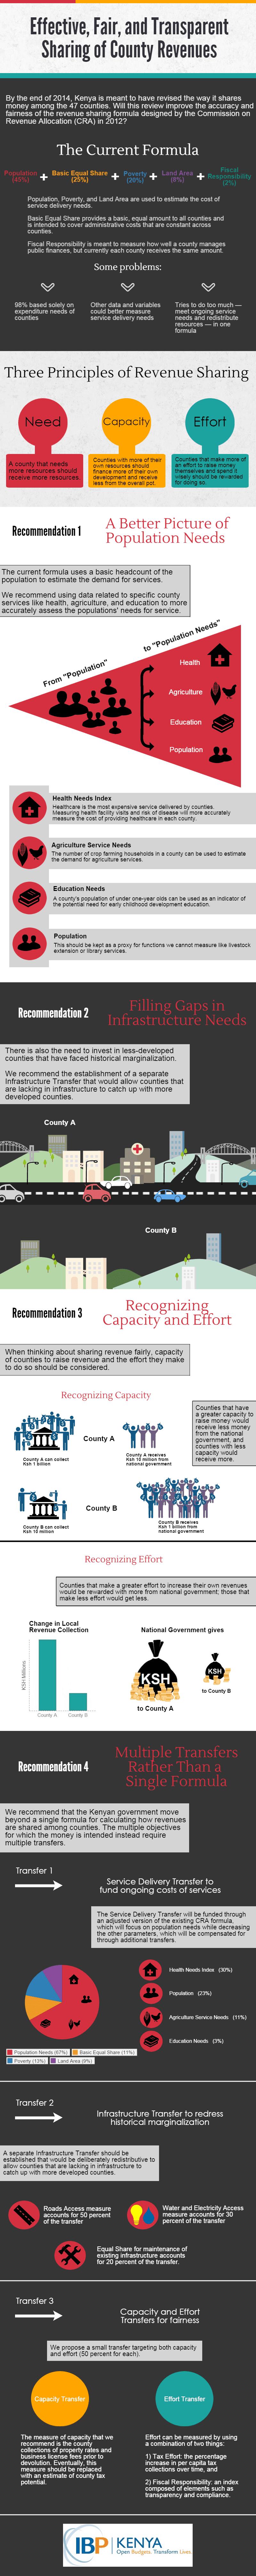 IBP Kenya CRA recommendations infographic